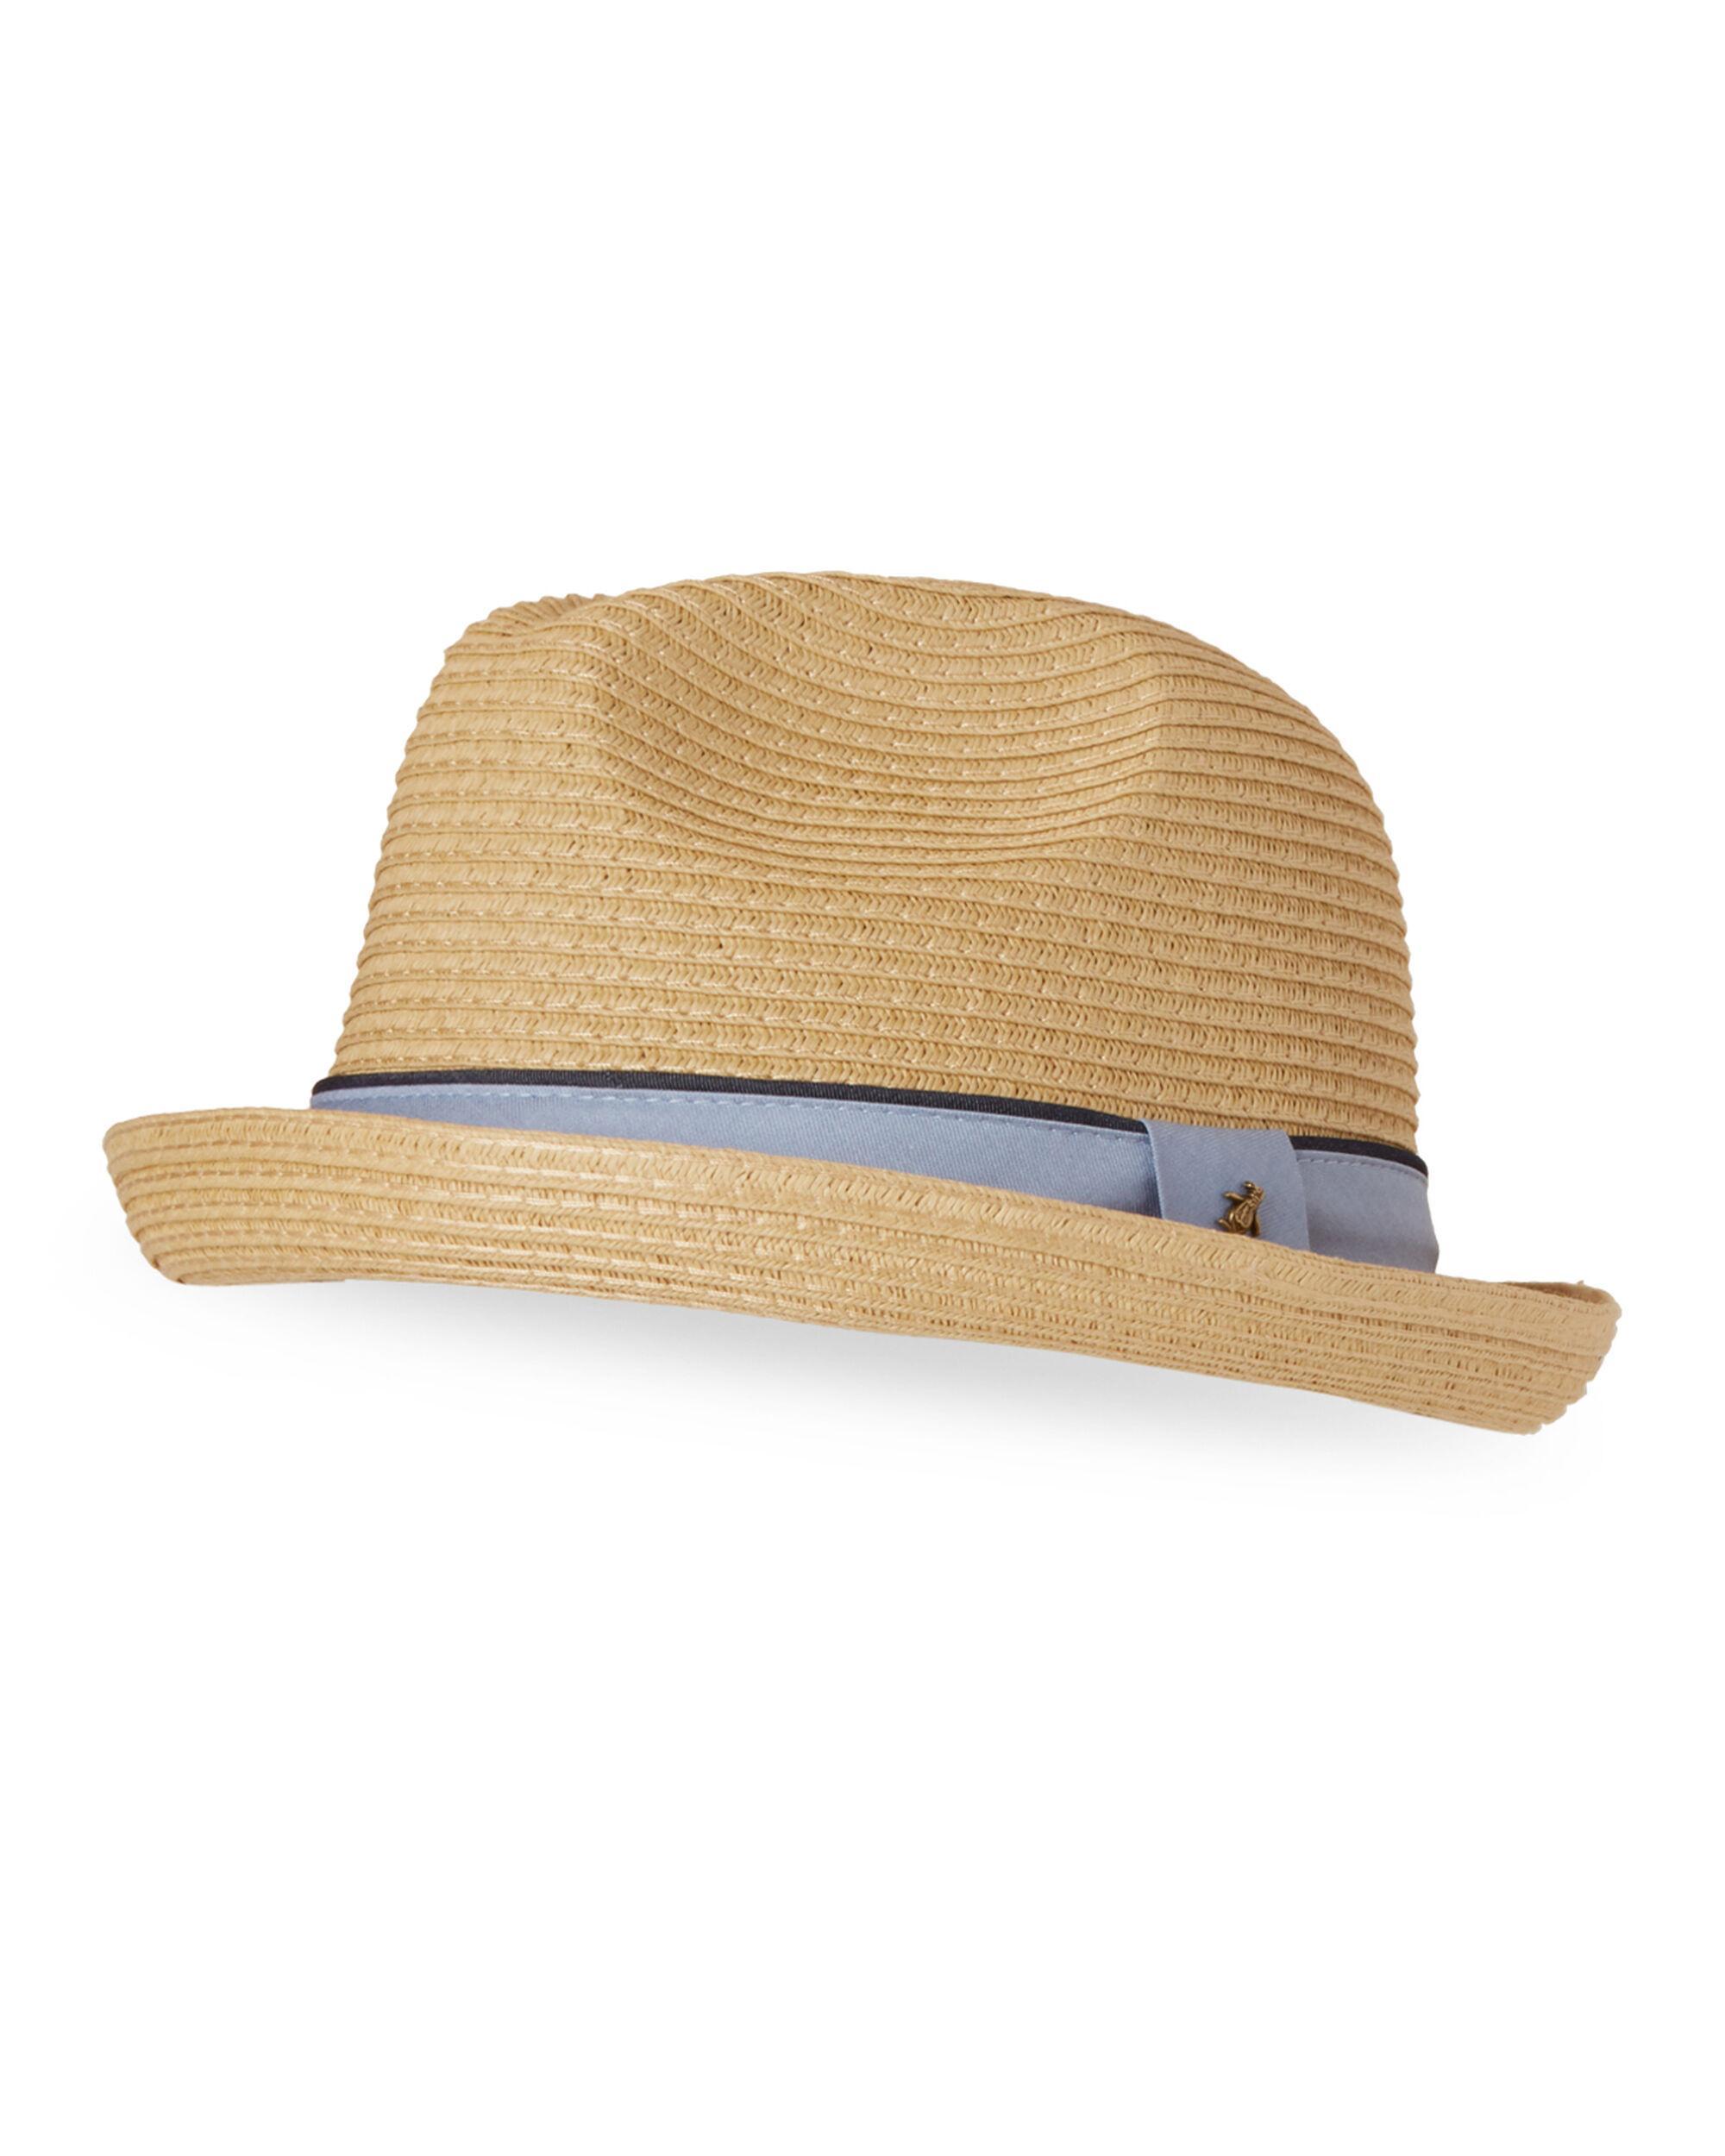 59f675ced45 Original Penguin Straw Pork Pie Hat in Natural for Men - Lyst